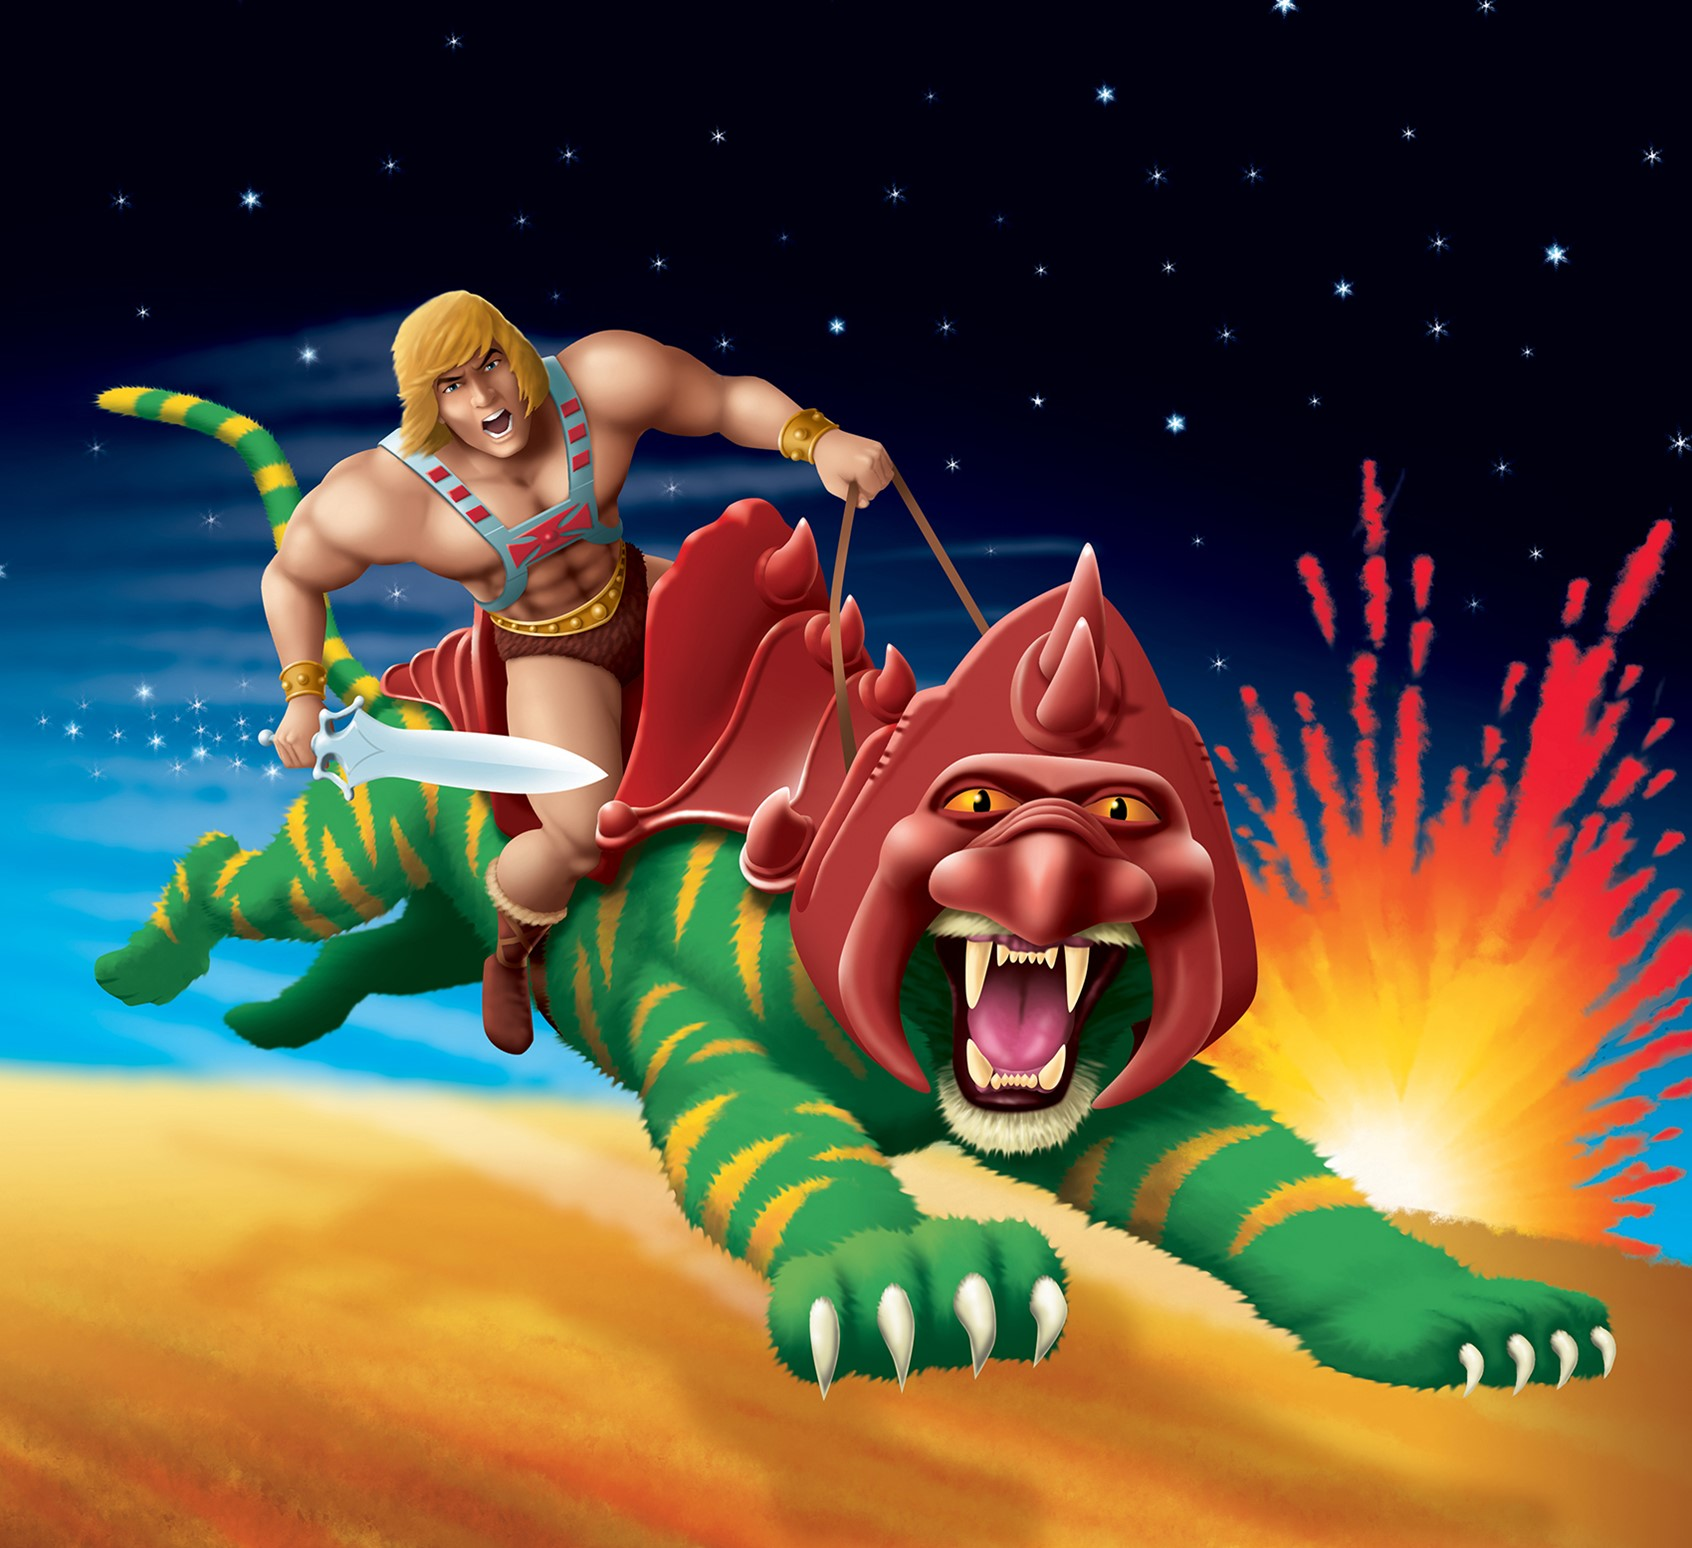 Robin Davies Illustration of He-Man